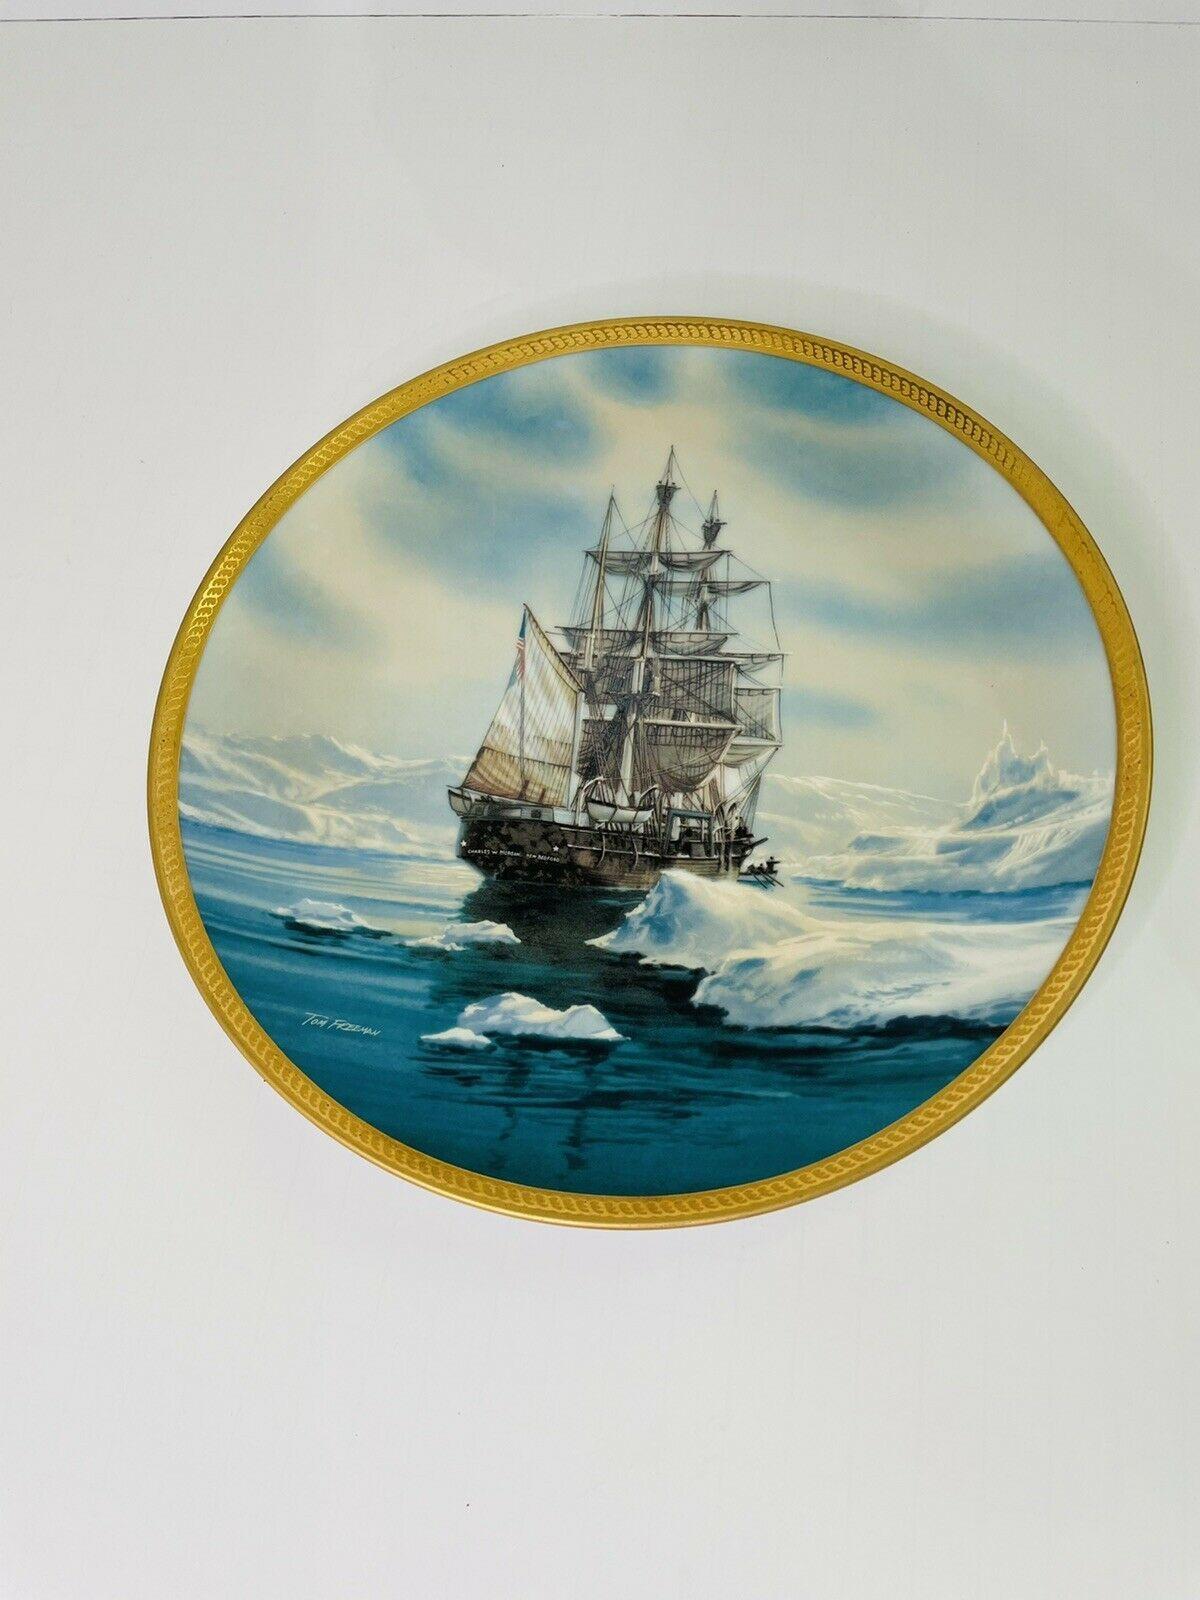 Charles W Morgan Hamilton Collection Plate 1987 - $29.67